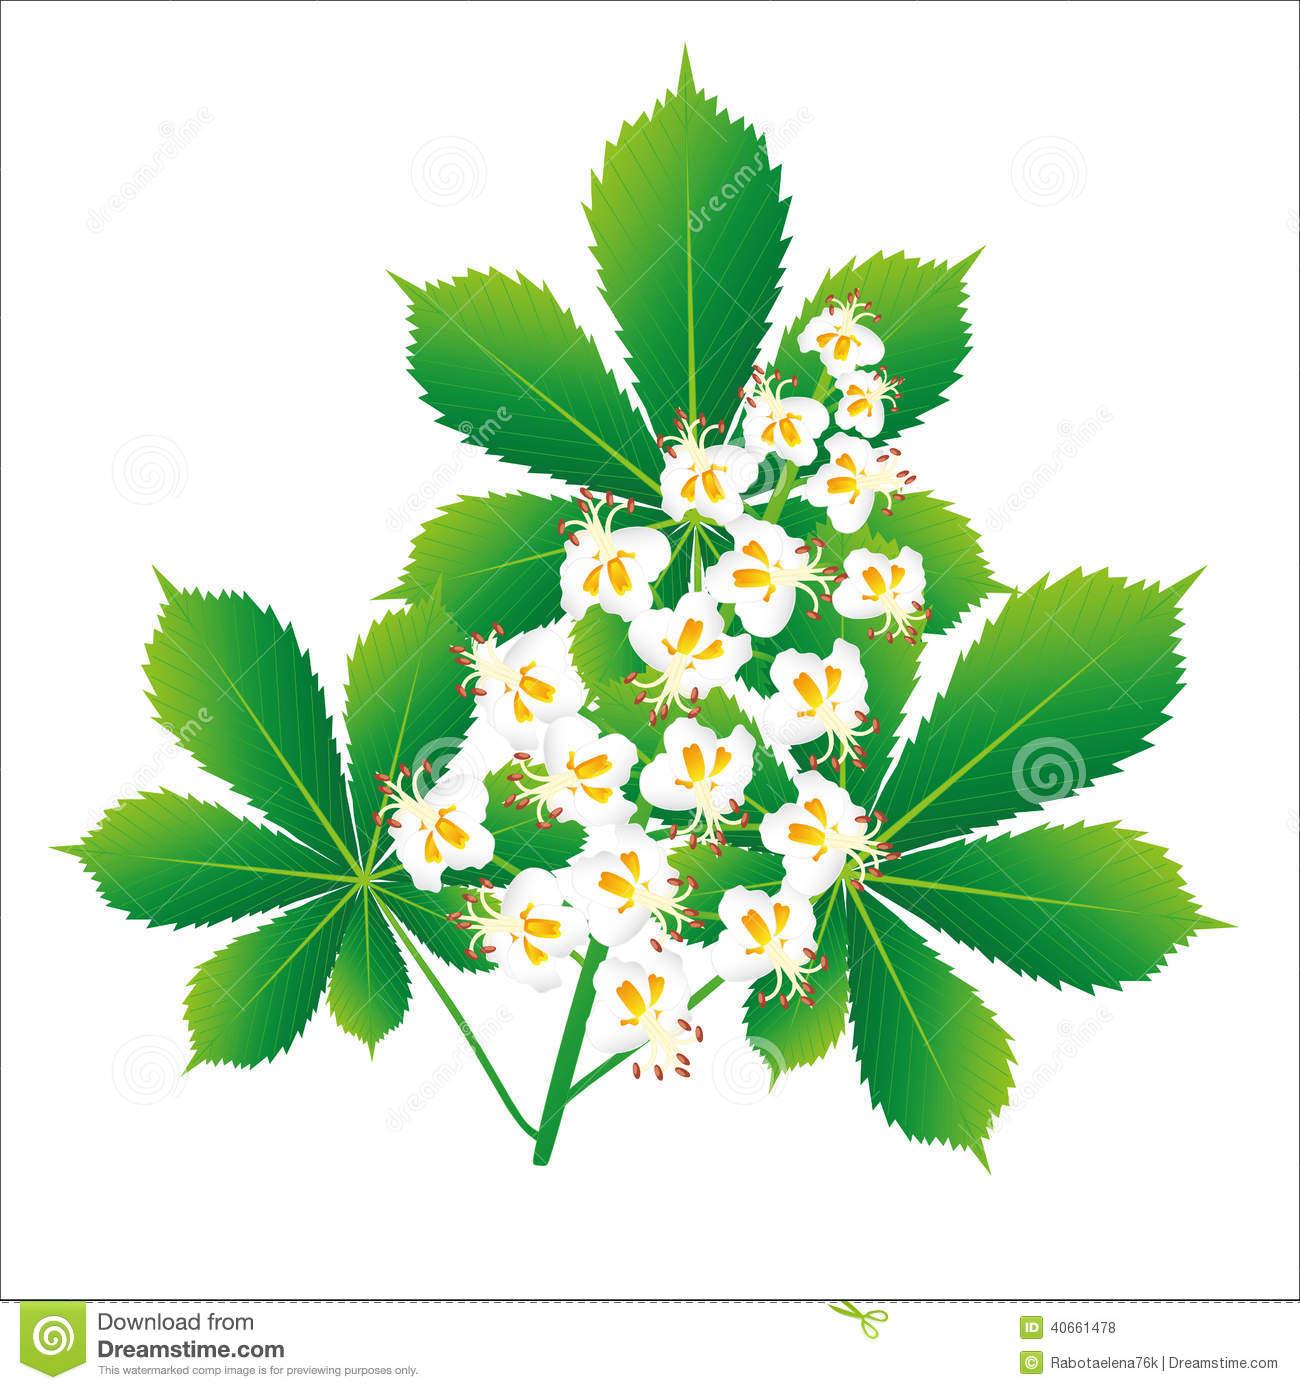 Chestnut blossom clipart #17